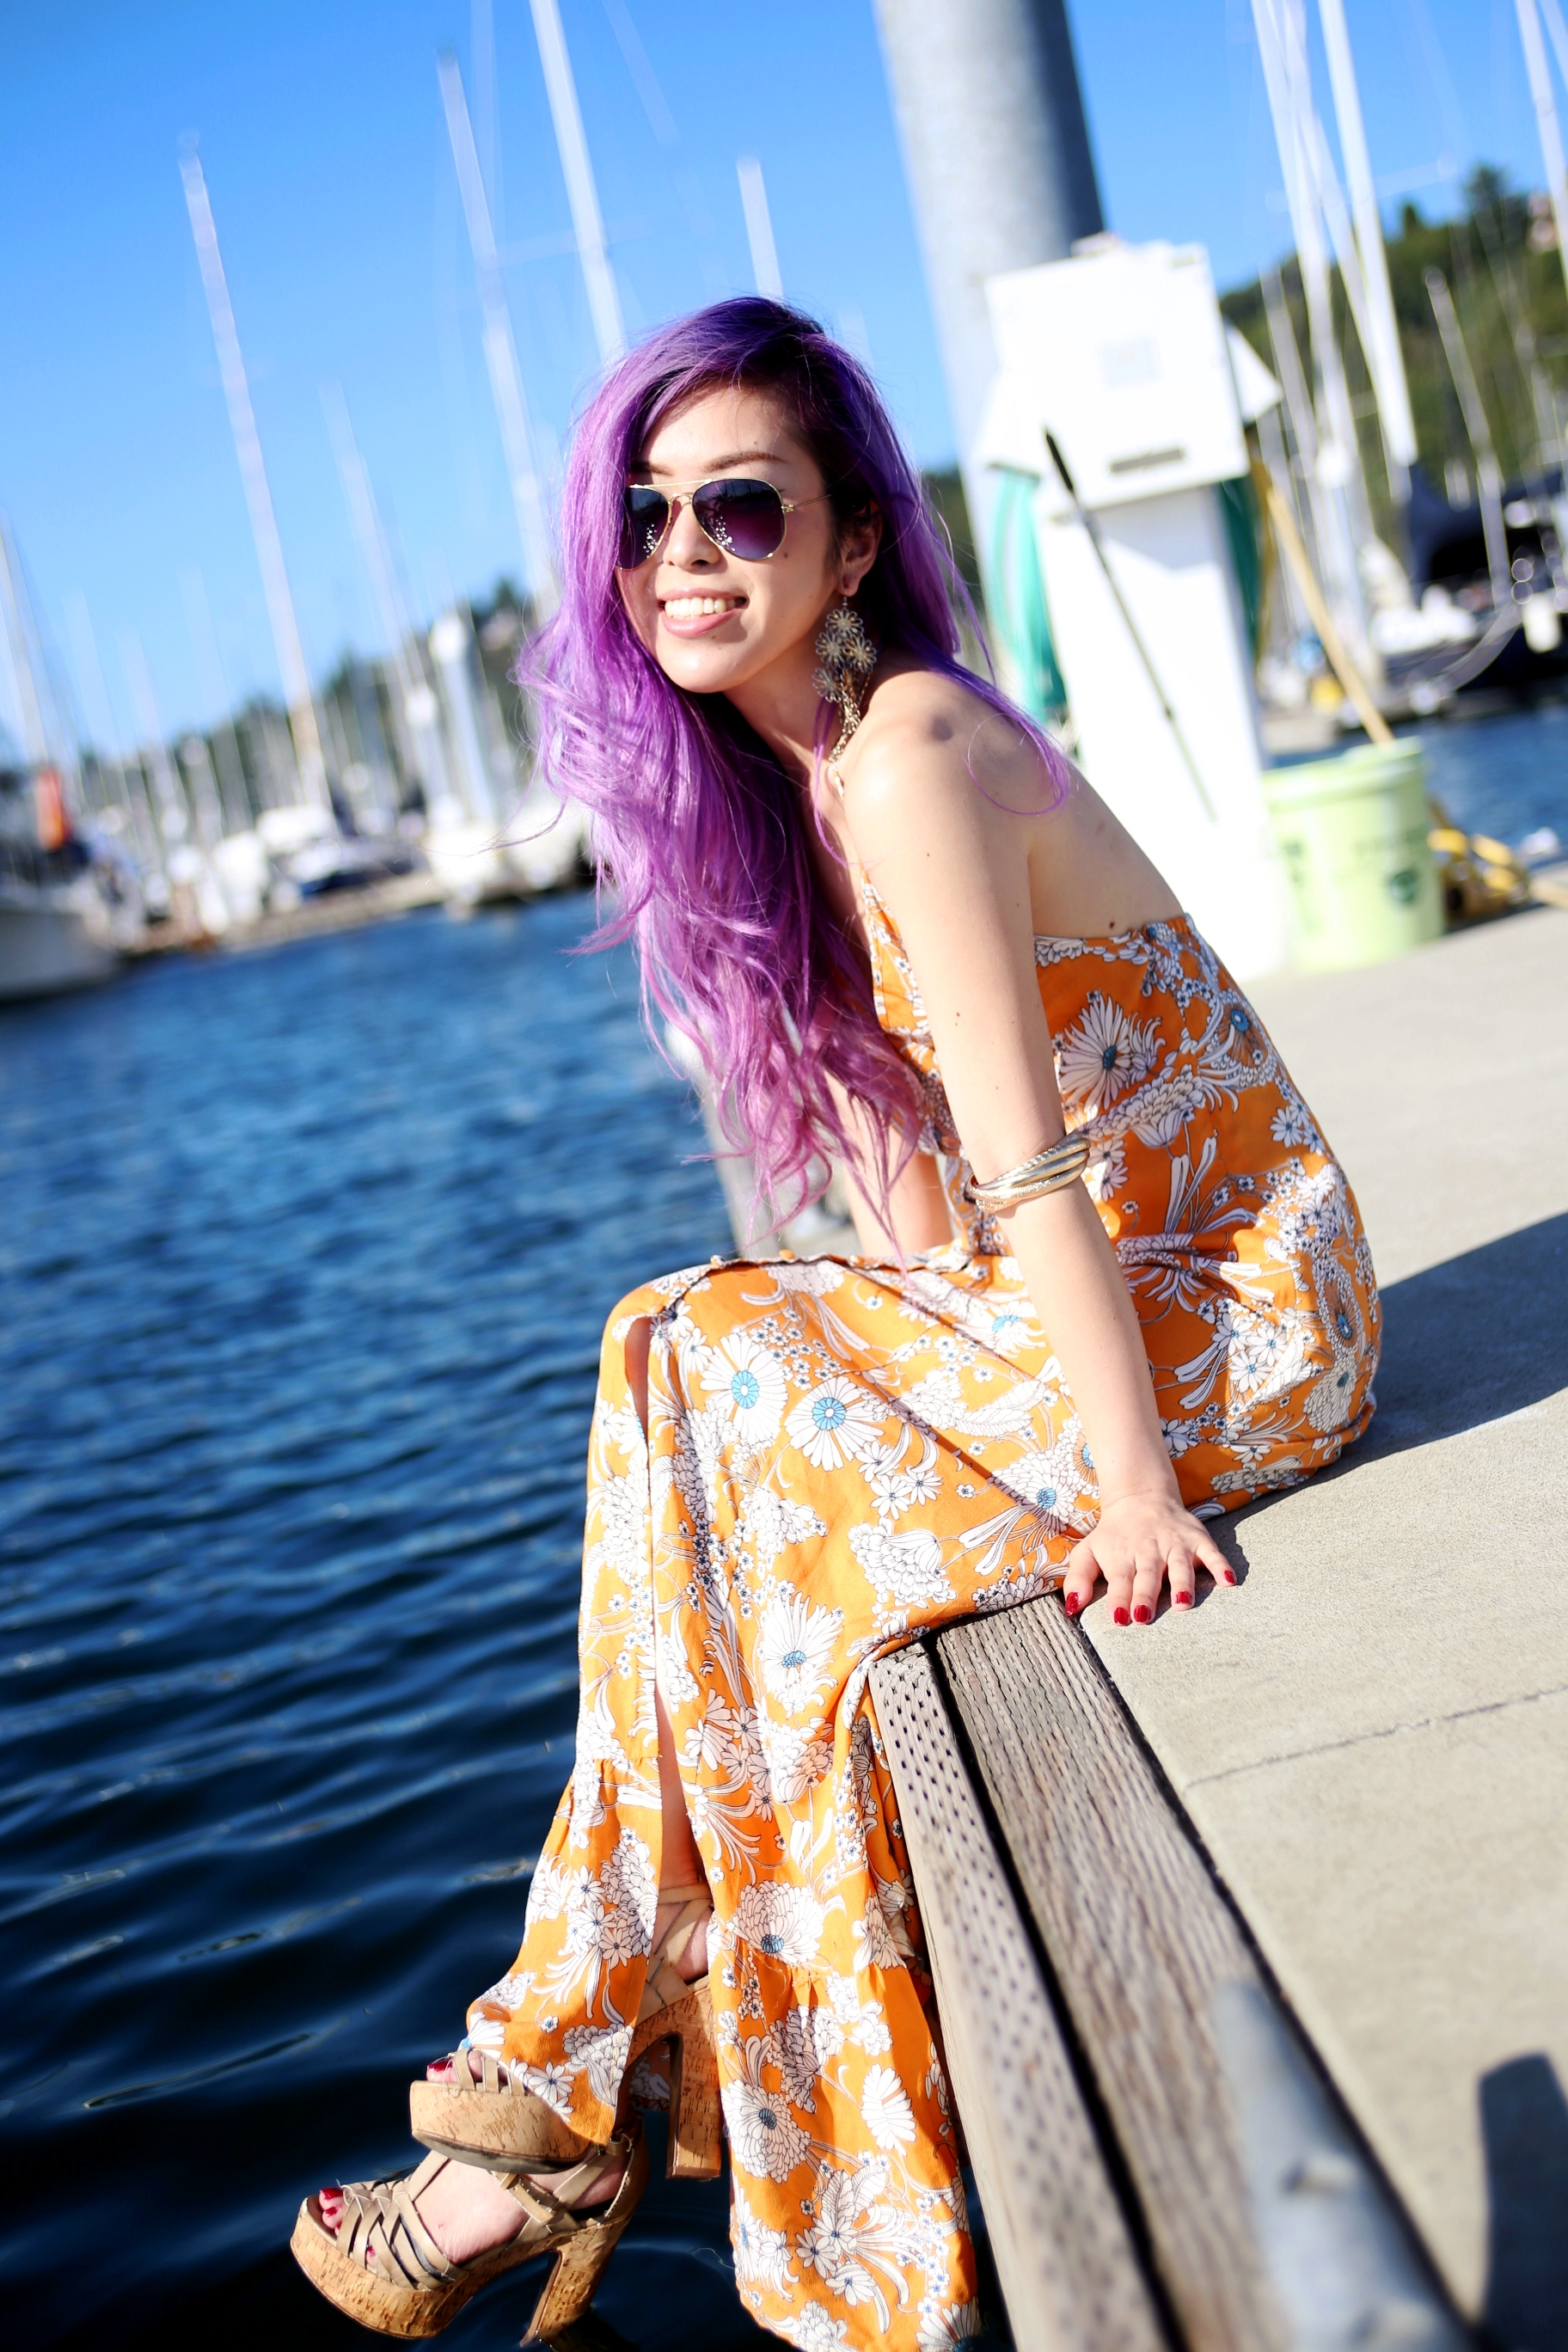 Target x Mady by MINKPINK Floral Halter Maxi Dress_H&M 4-pack bracelets_ALDO Platform Sandals_Ray Ban Blue Aviator Sunglasses_Aikas Love Closet_Seattle Fashion Blogger From Japan_Purple hair_Mermaid Hair